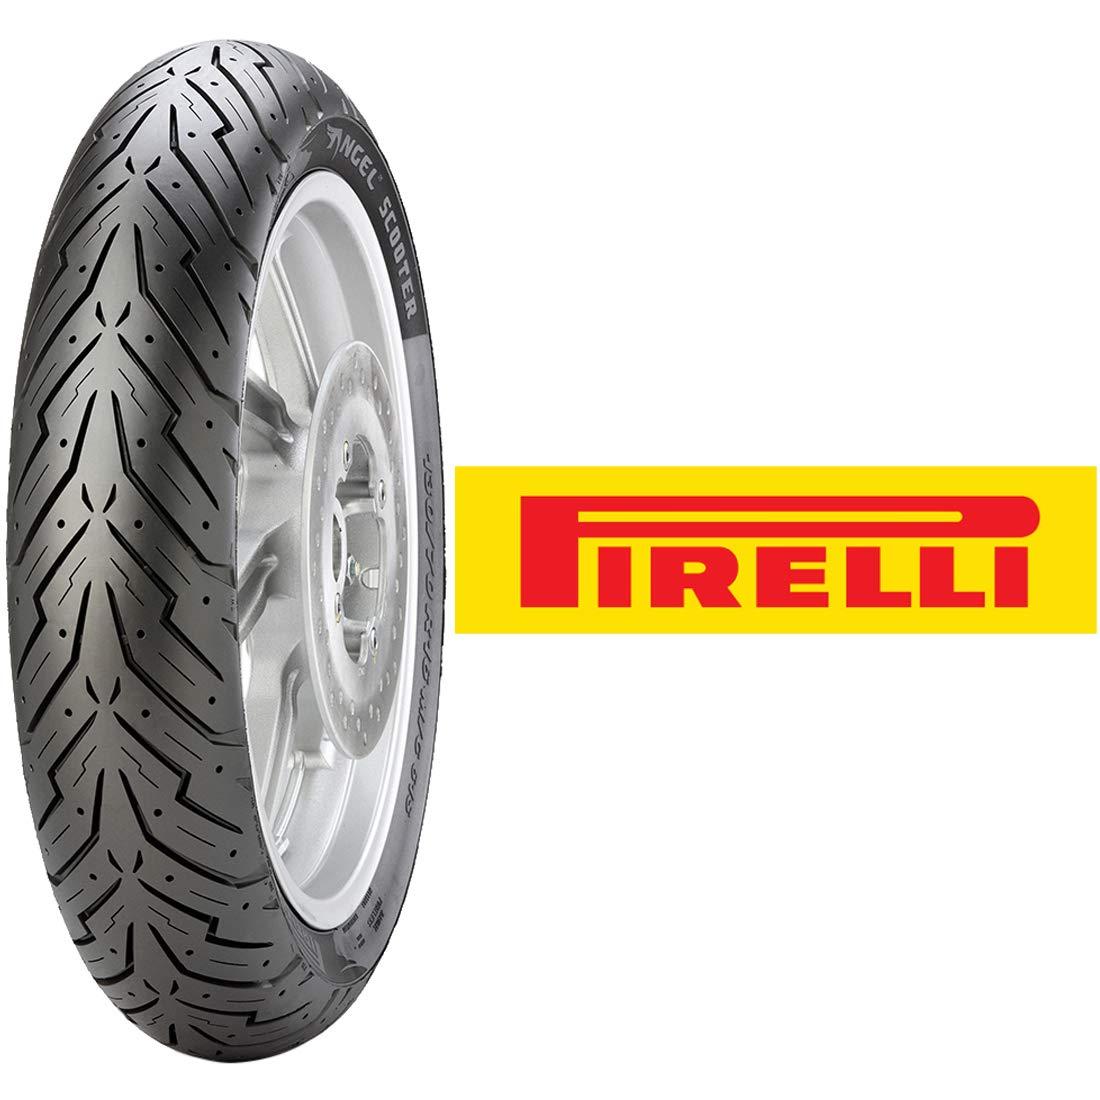 Pirelli Angel Rear Scooter Tire (120/70-12) by Pirelli